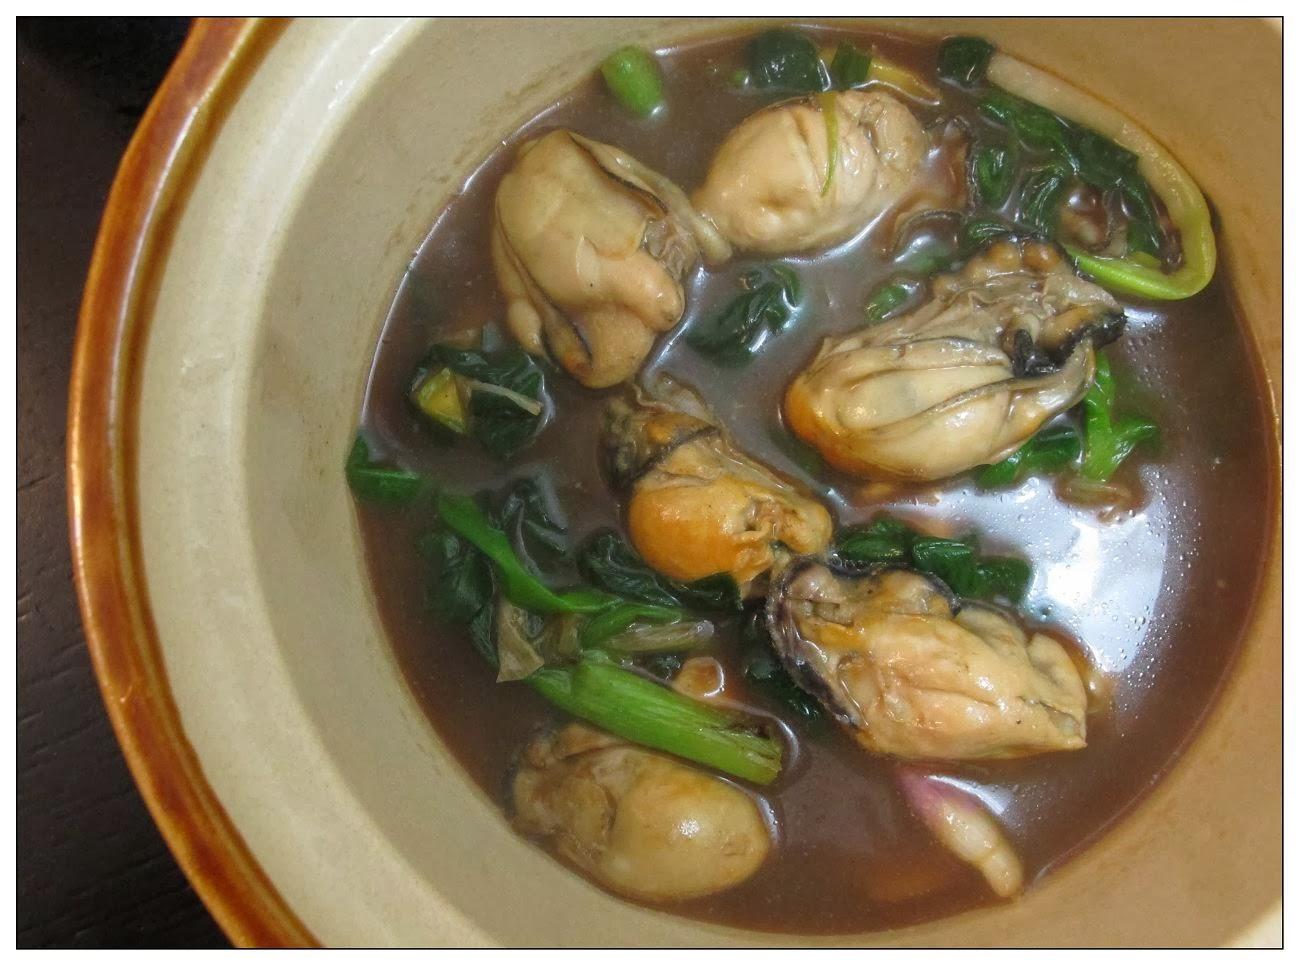 Babymama: 薑蔥生蠔 + 茄汁羊蔥豬扒 + 菜心 ( 6-FEB-2014 )